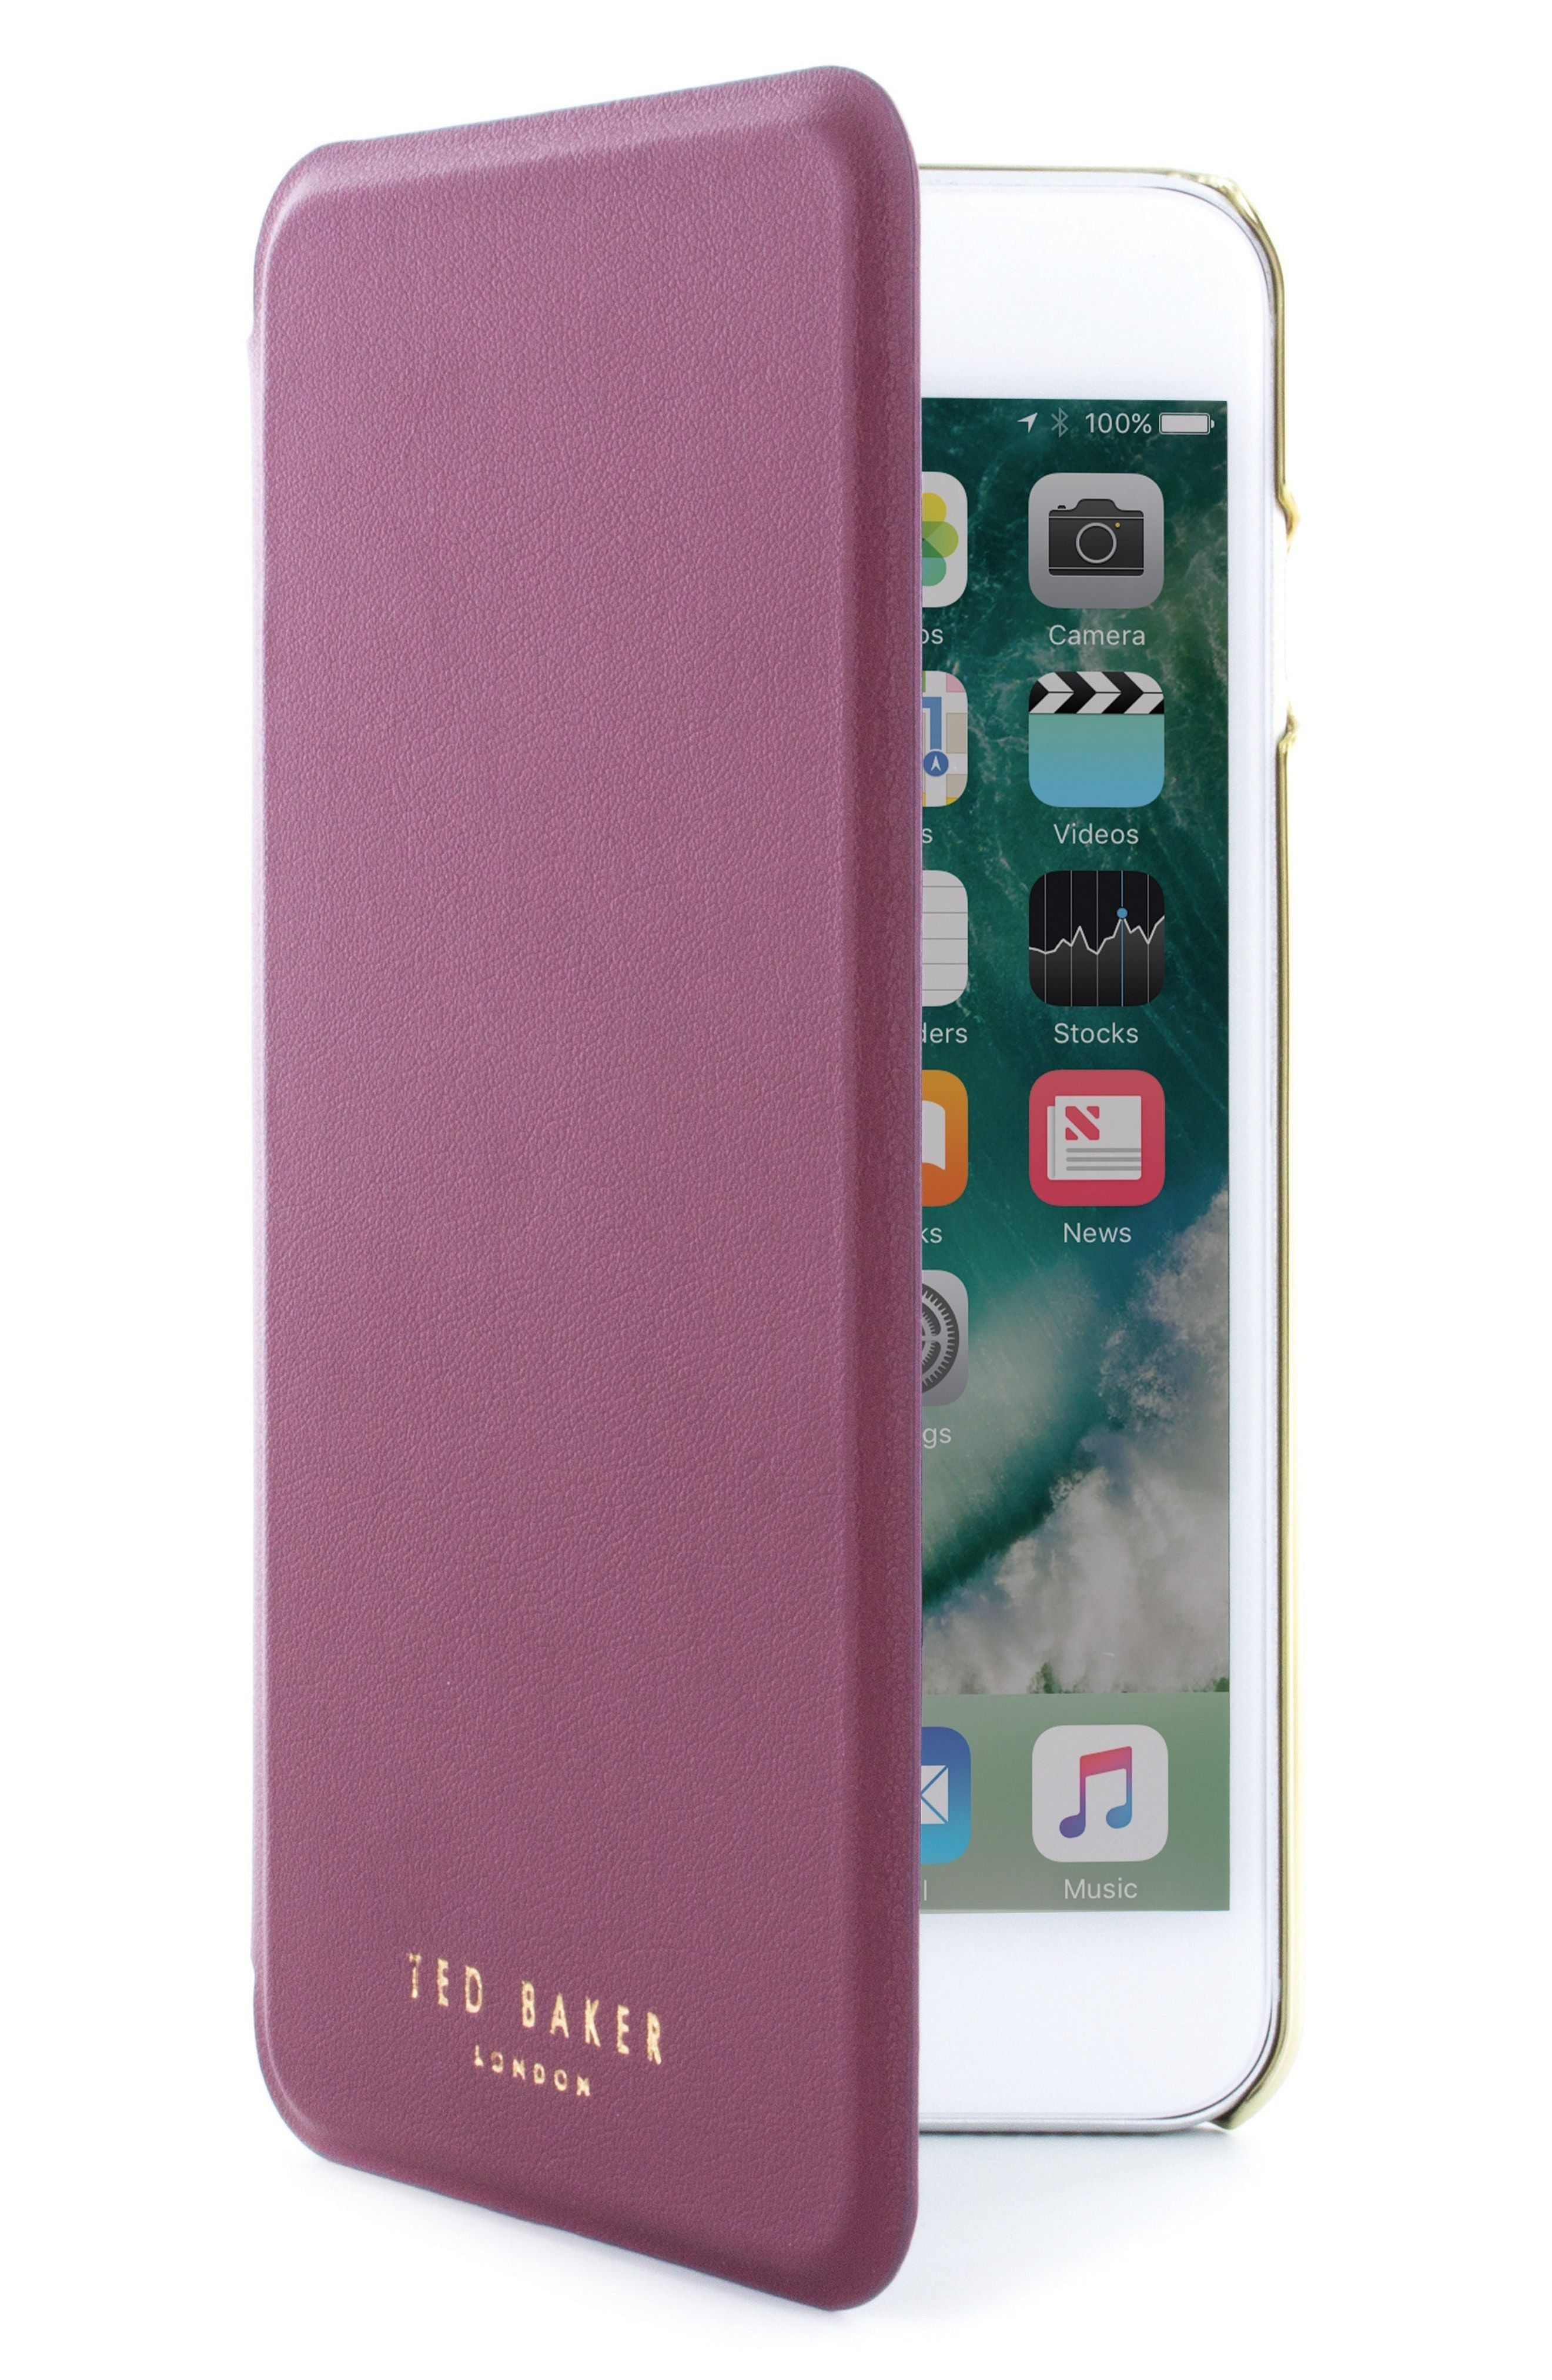 fec17eae5aa632 New Ted Baker London Shannon iPhone 6 7 Plus Mirror Folio Case fashion  online.   49.99   shop.seehandbags